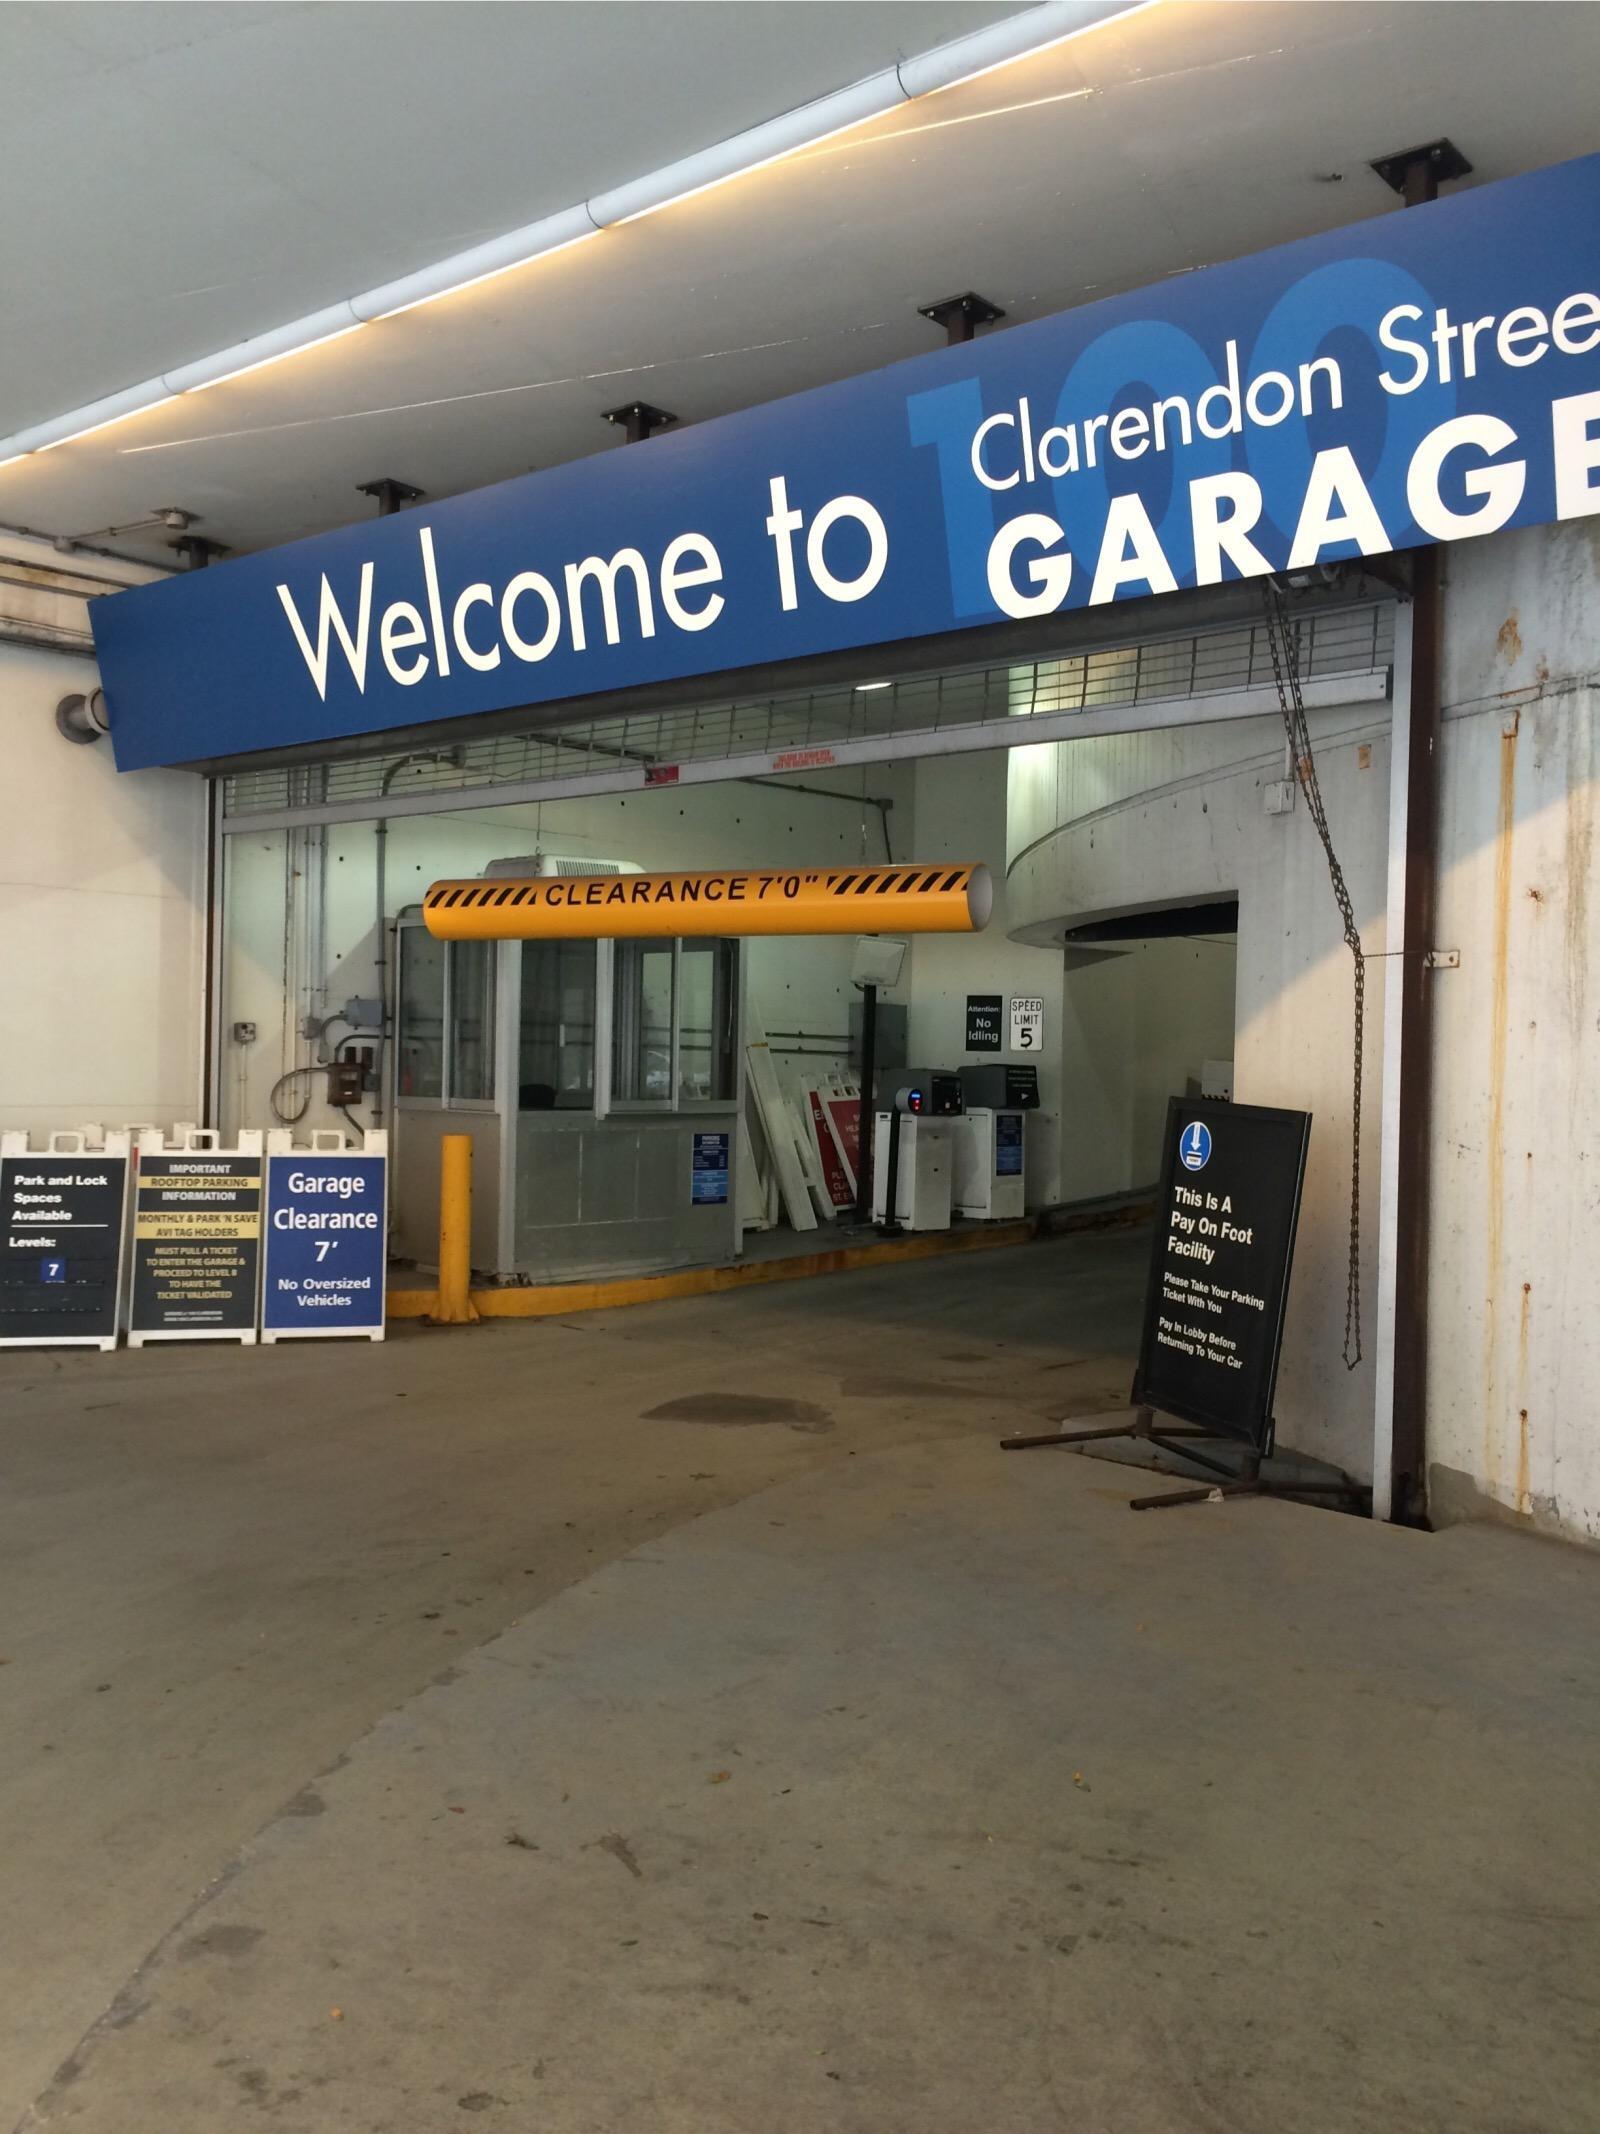 100 clarendon street garage parking in boston parkme - 100 clarendon street garage ...